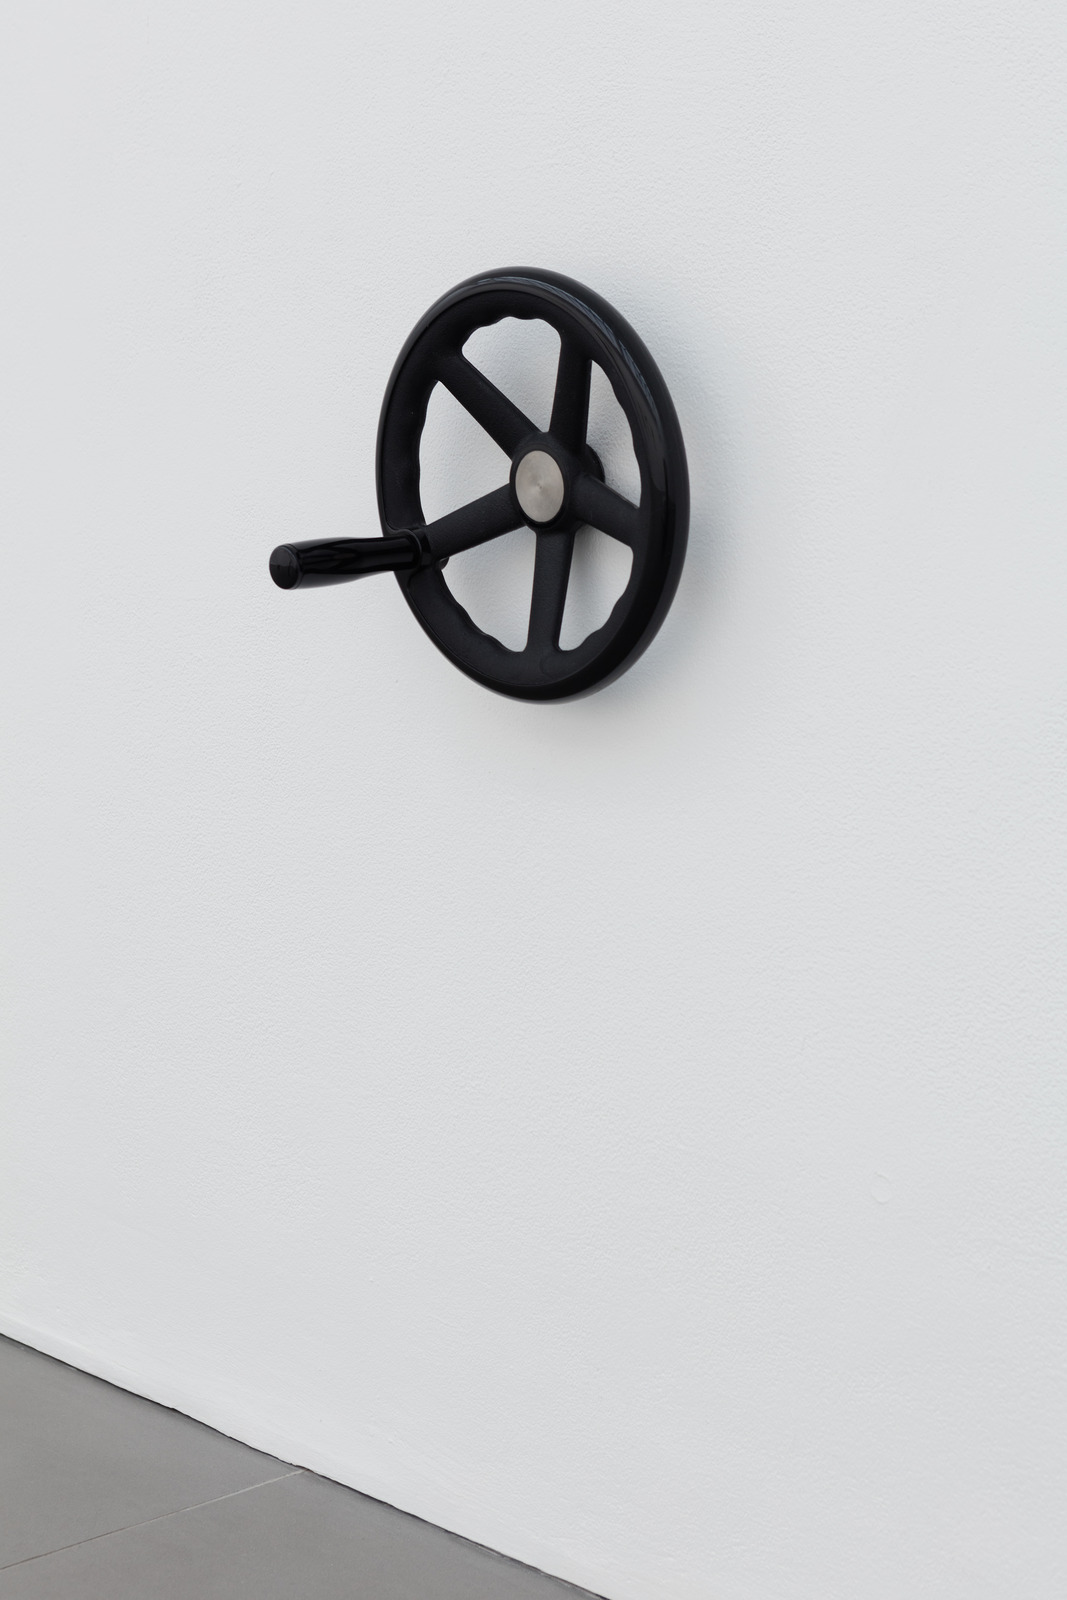 11.Aude Pariset. Petite SUV I, 2016, Plastic, cast iron, 25 ├ÿ x 16,6 cm